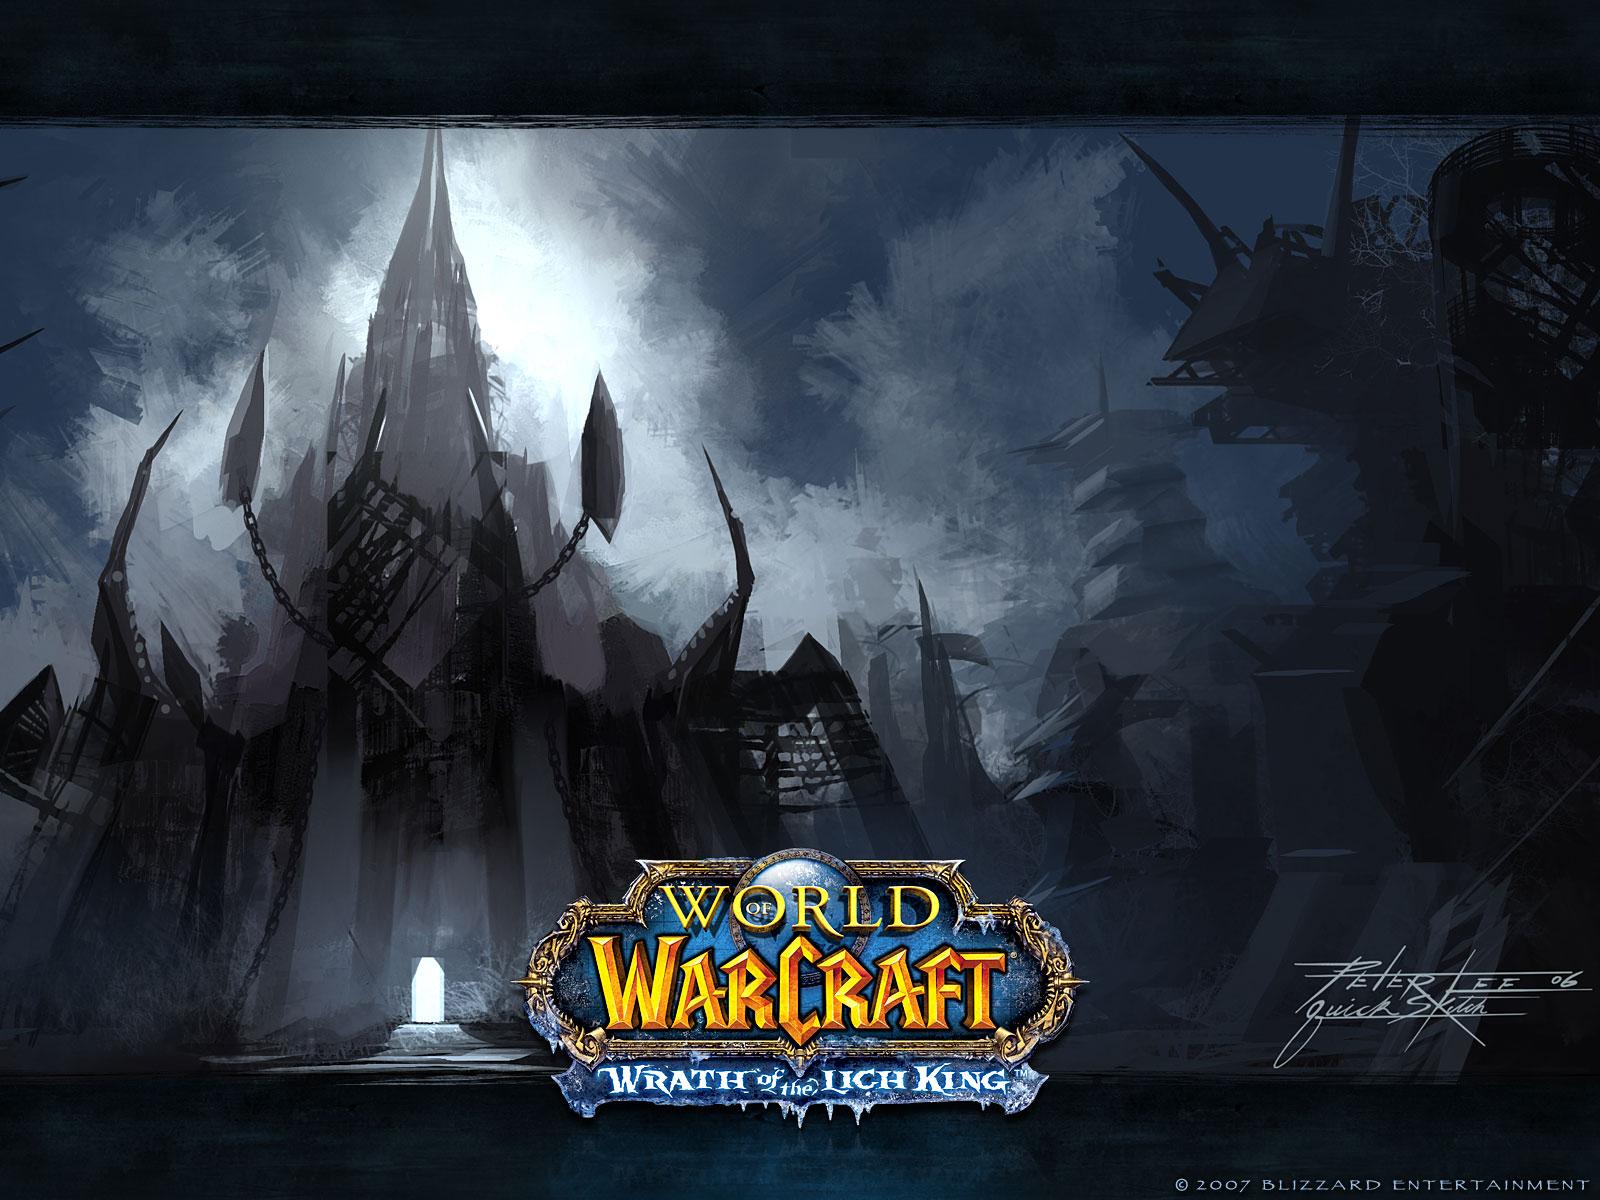 http://1.bp.blogspot.com/-ALX6J58q81o/Tja77RAQAiI/AAAAAAAAGkY/sXokivOFZHk/s1600/Games_wallpapers_warcraft_02.jpg